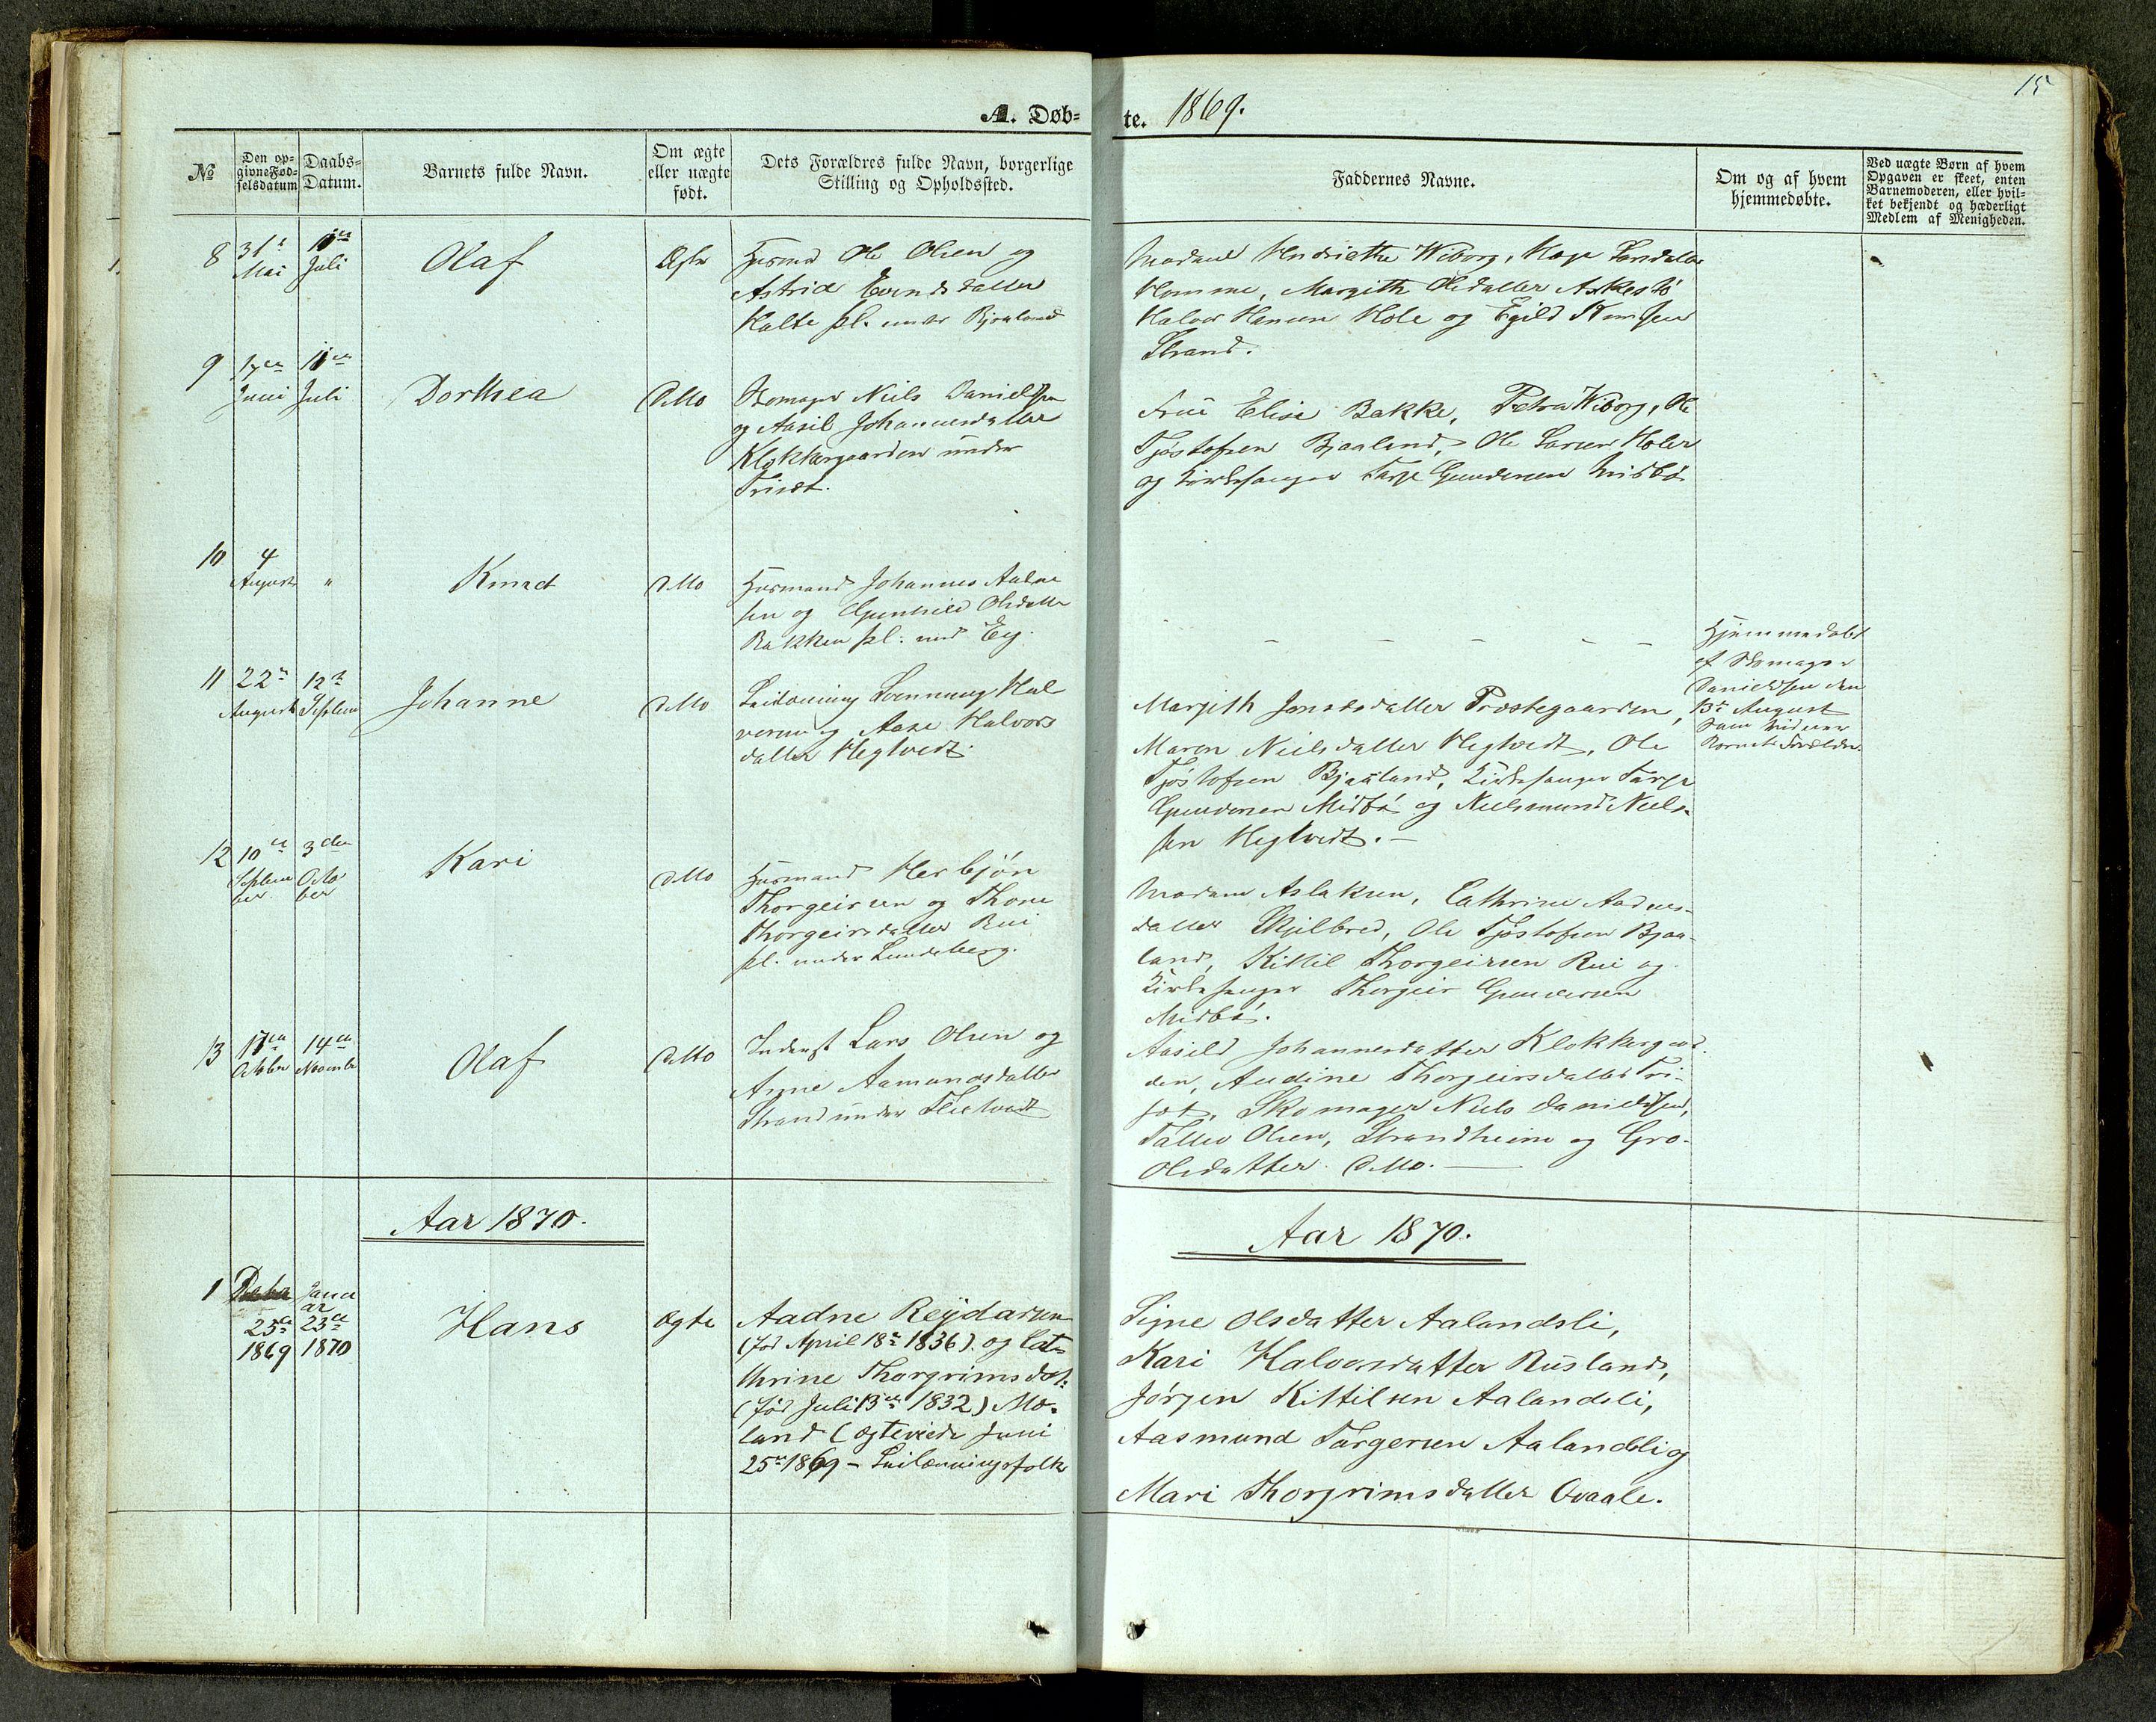 SAKO, Lårdal kirkebøker, G/Ga/L0002: Klokkerbok nr. I 2, 1861-1890, s. 15